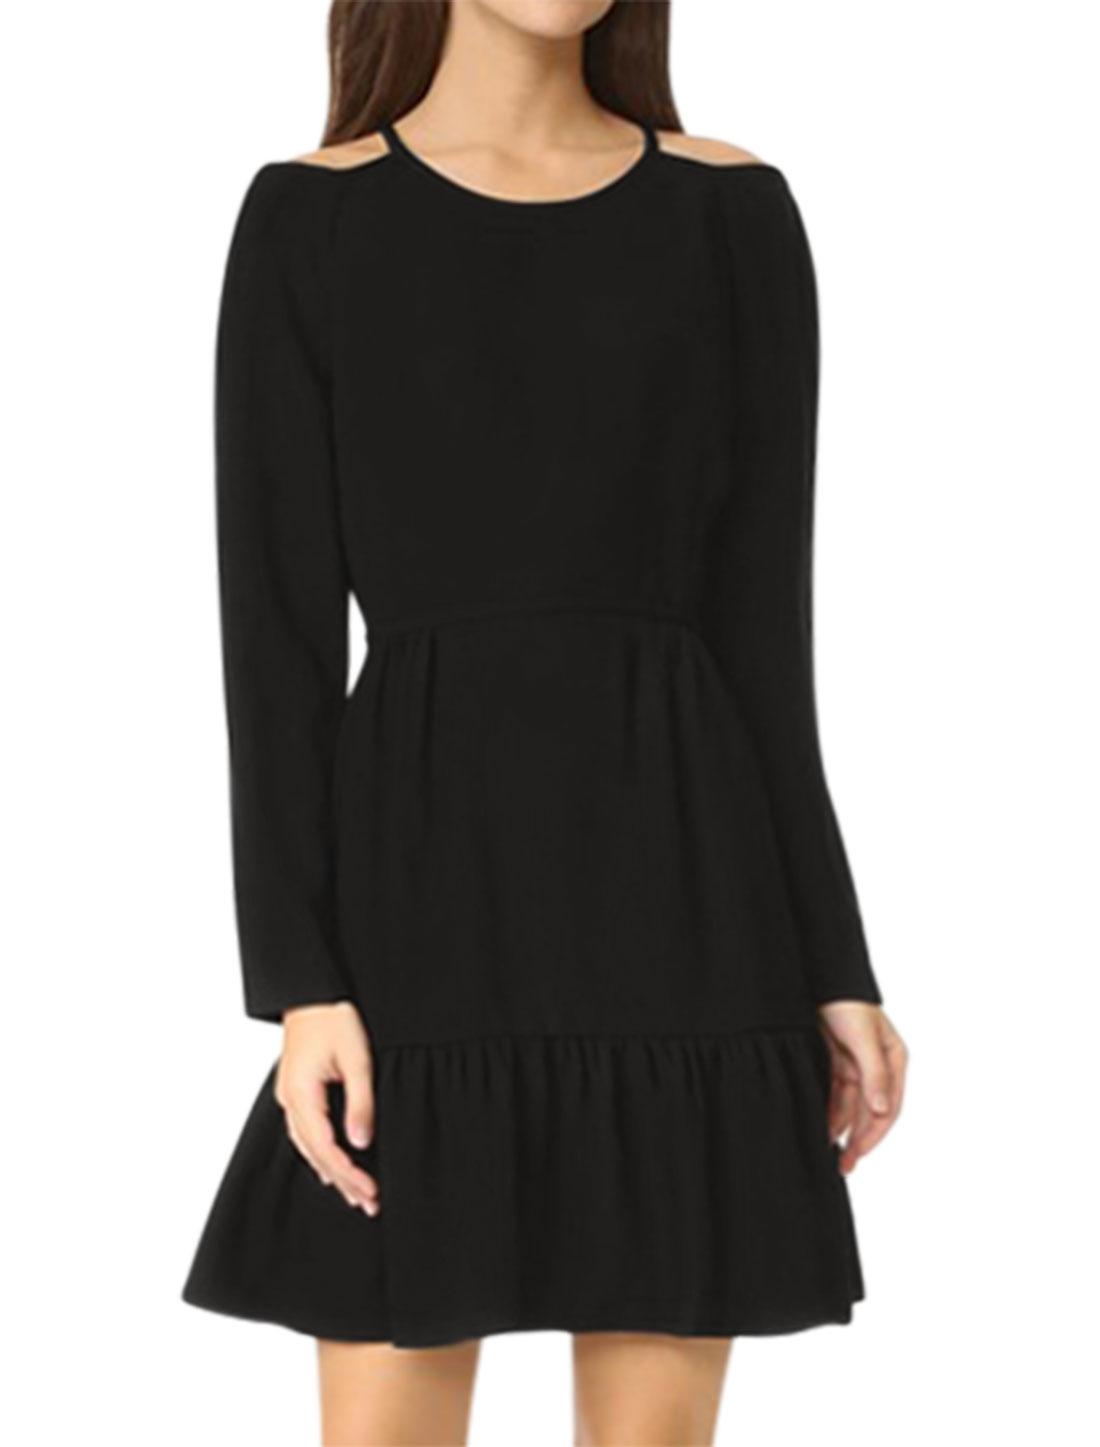 Women Cold Shoulder Long Sleeves Flouncing Hem Tunic Dress Black L